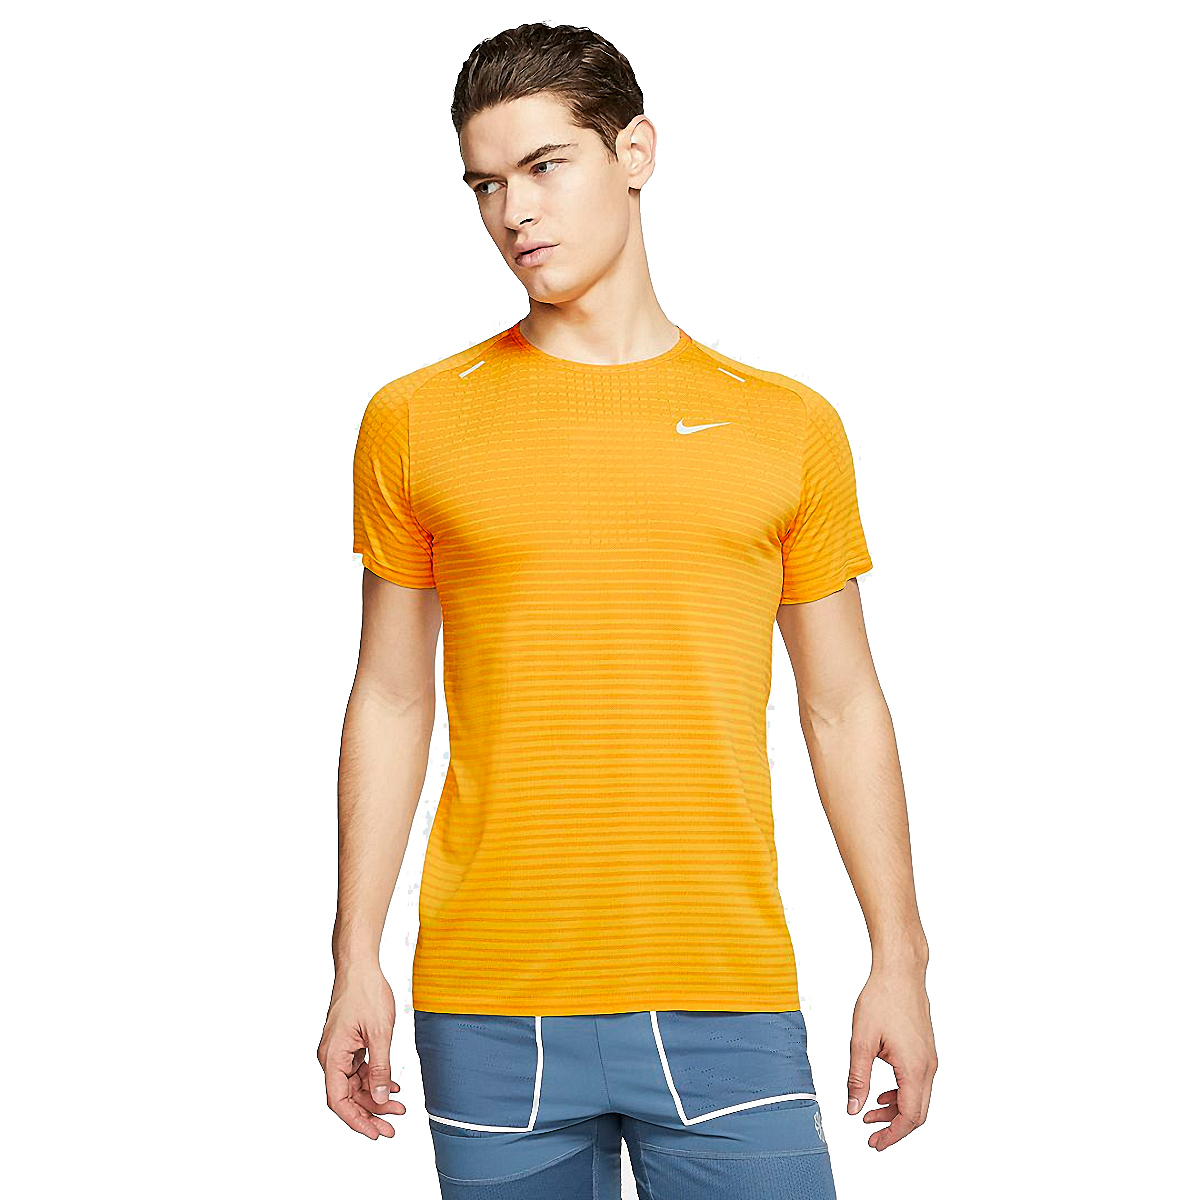 Men's Nike Techknit Ultra Short Sleeve  - Color: University Gold - Size: S, University Gold, large, image 1